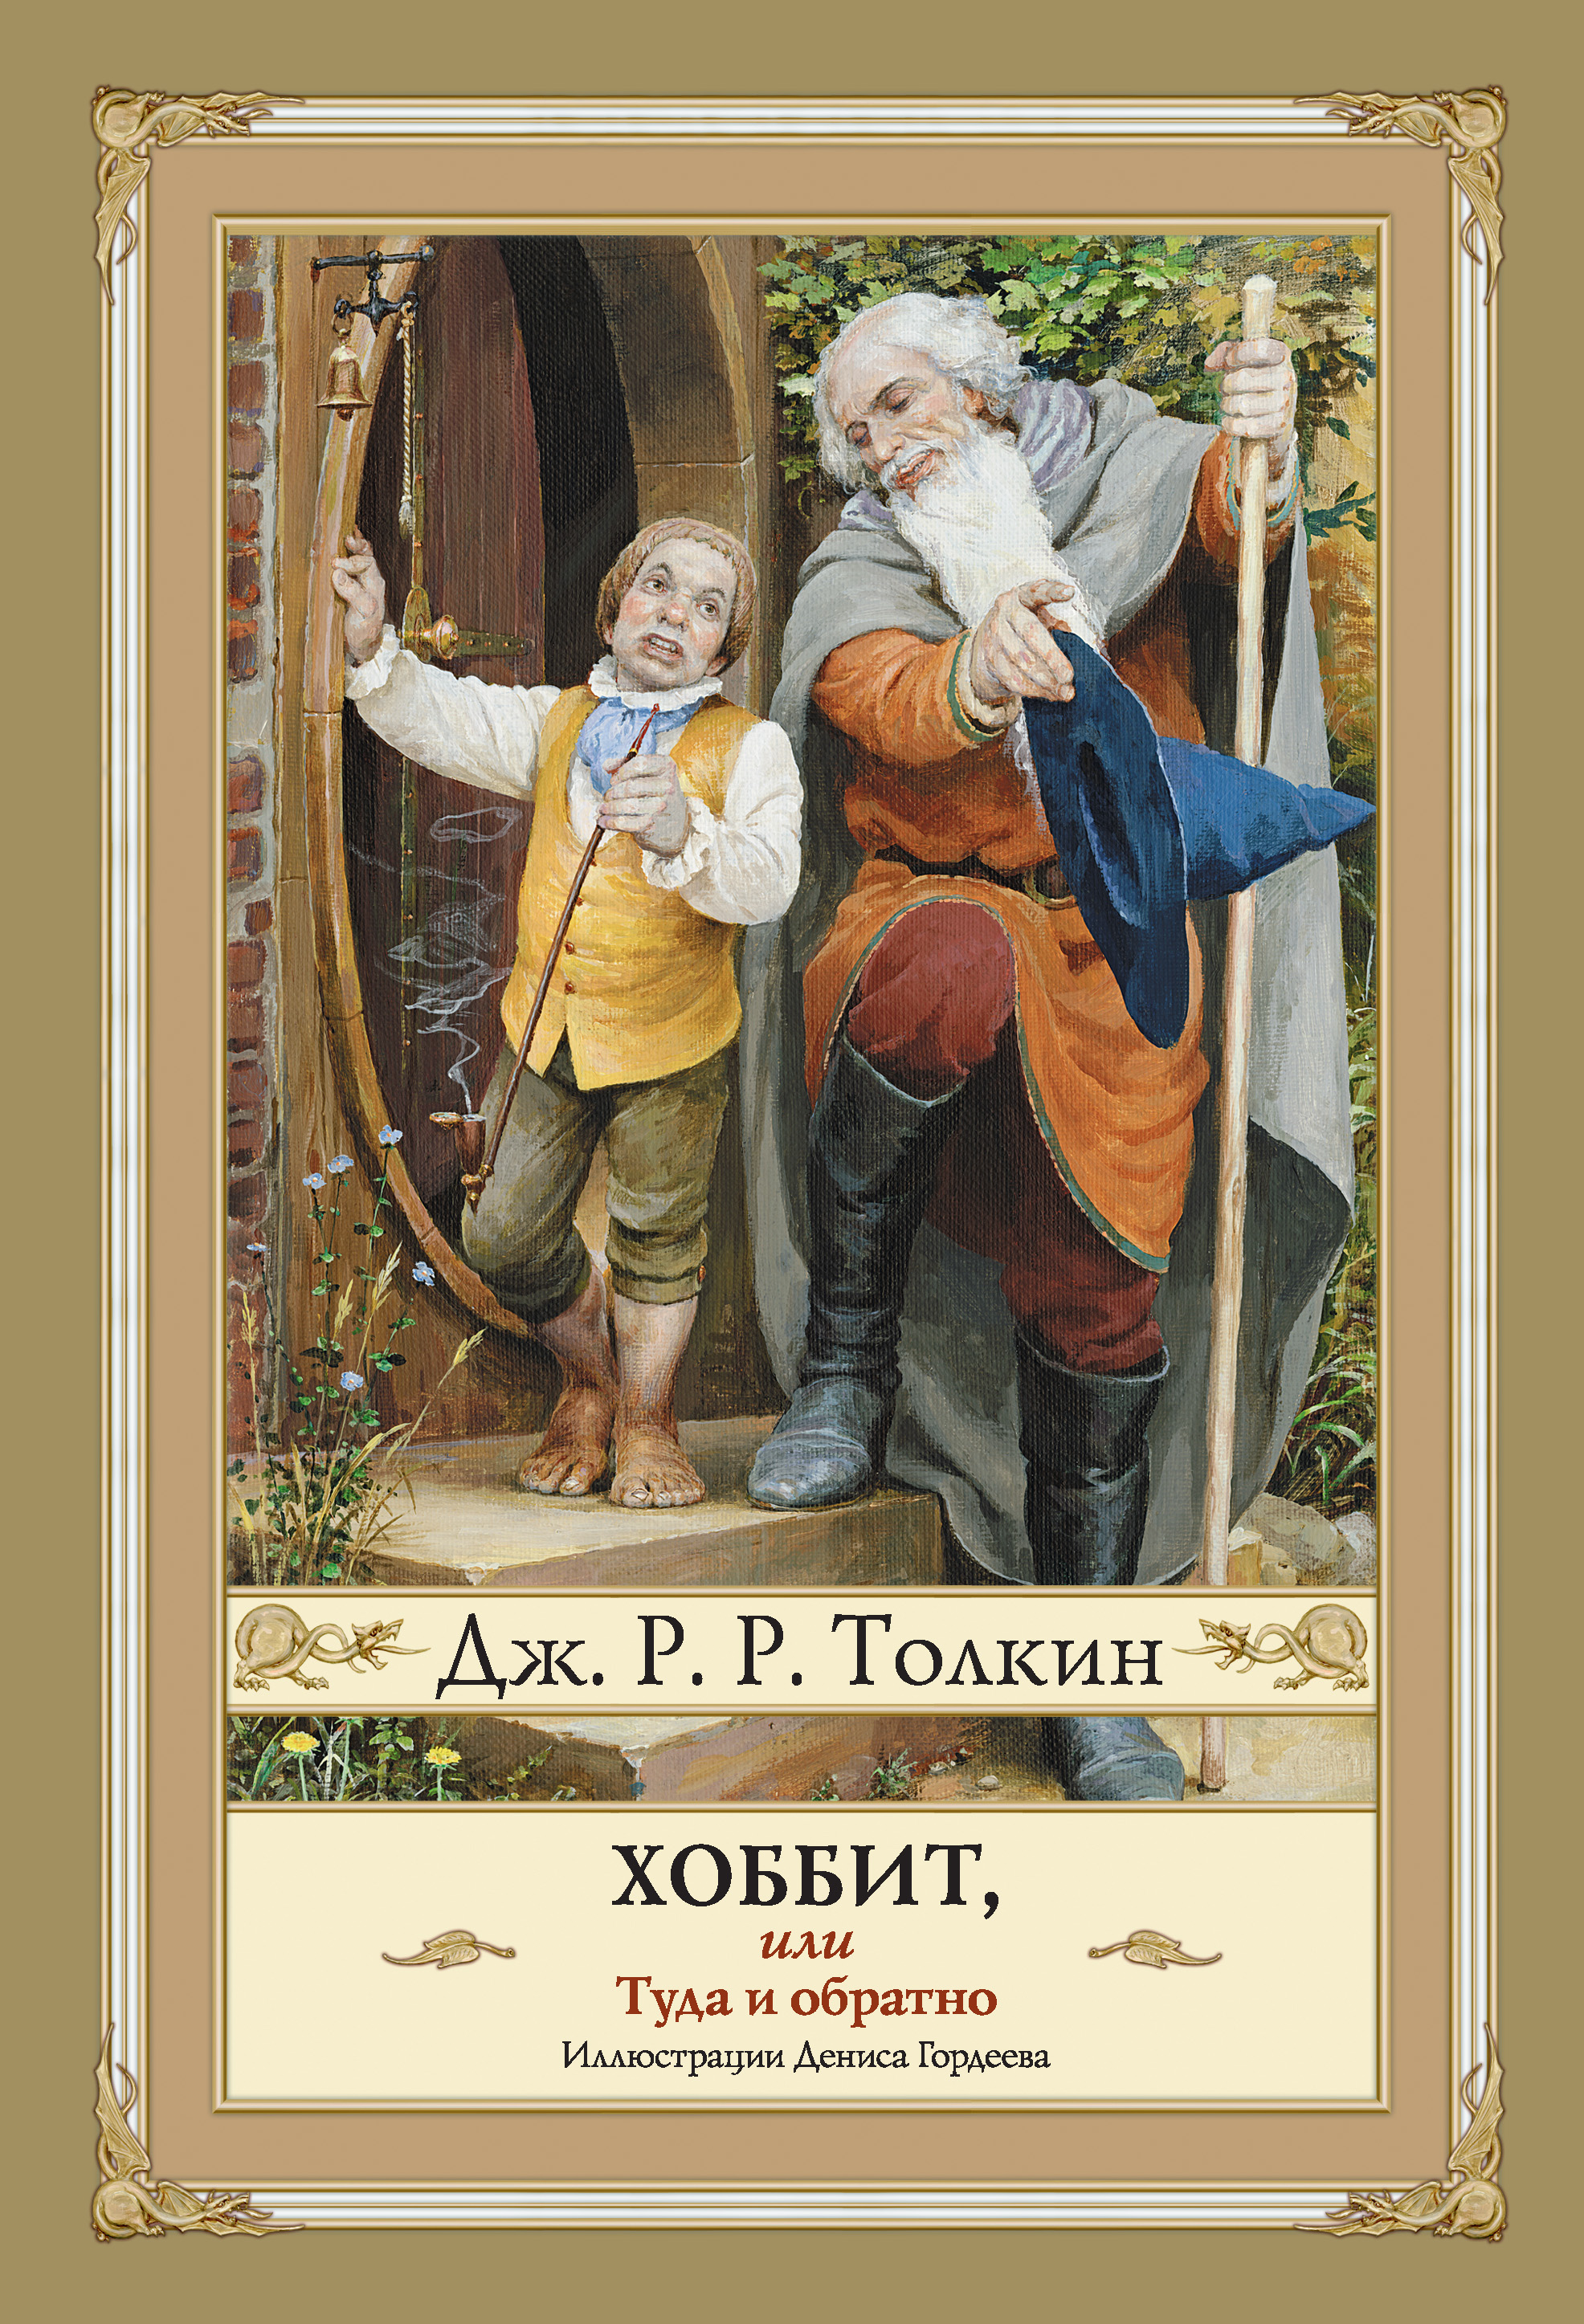 Джон Толкин «Хоббит, или Туда и Обратно»